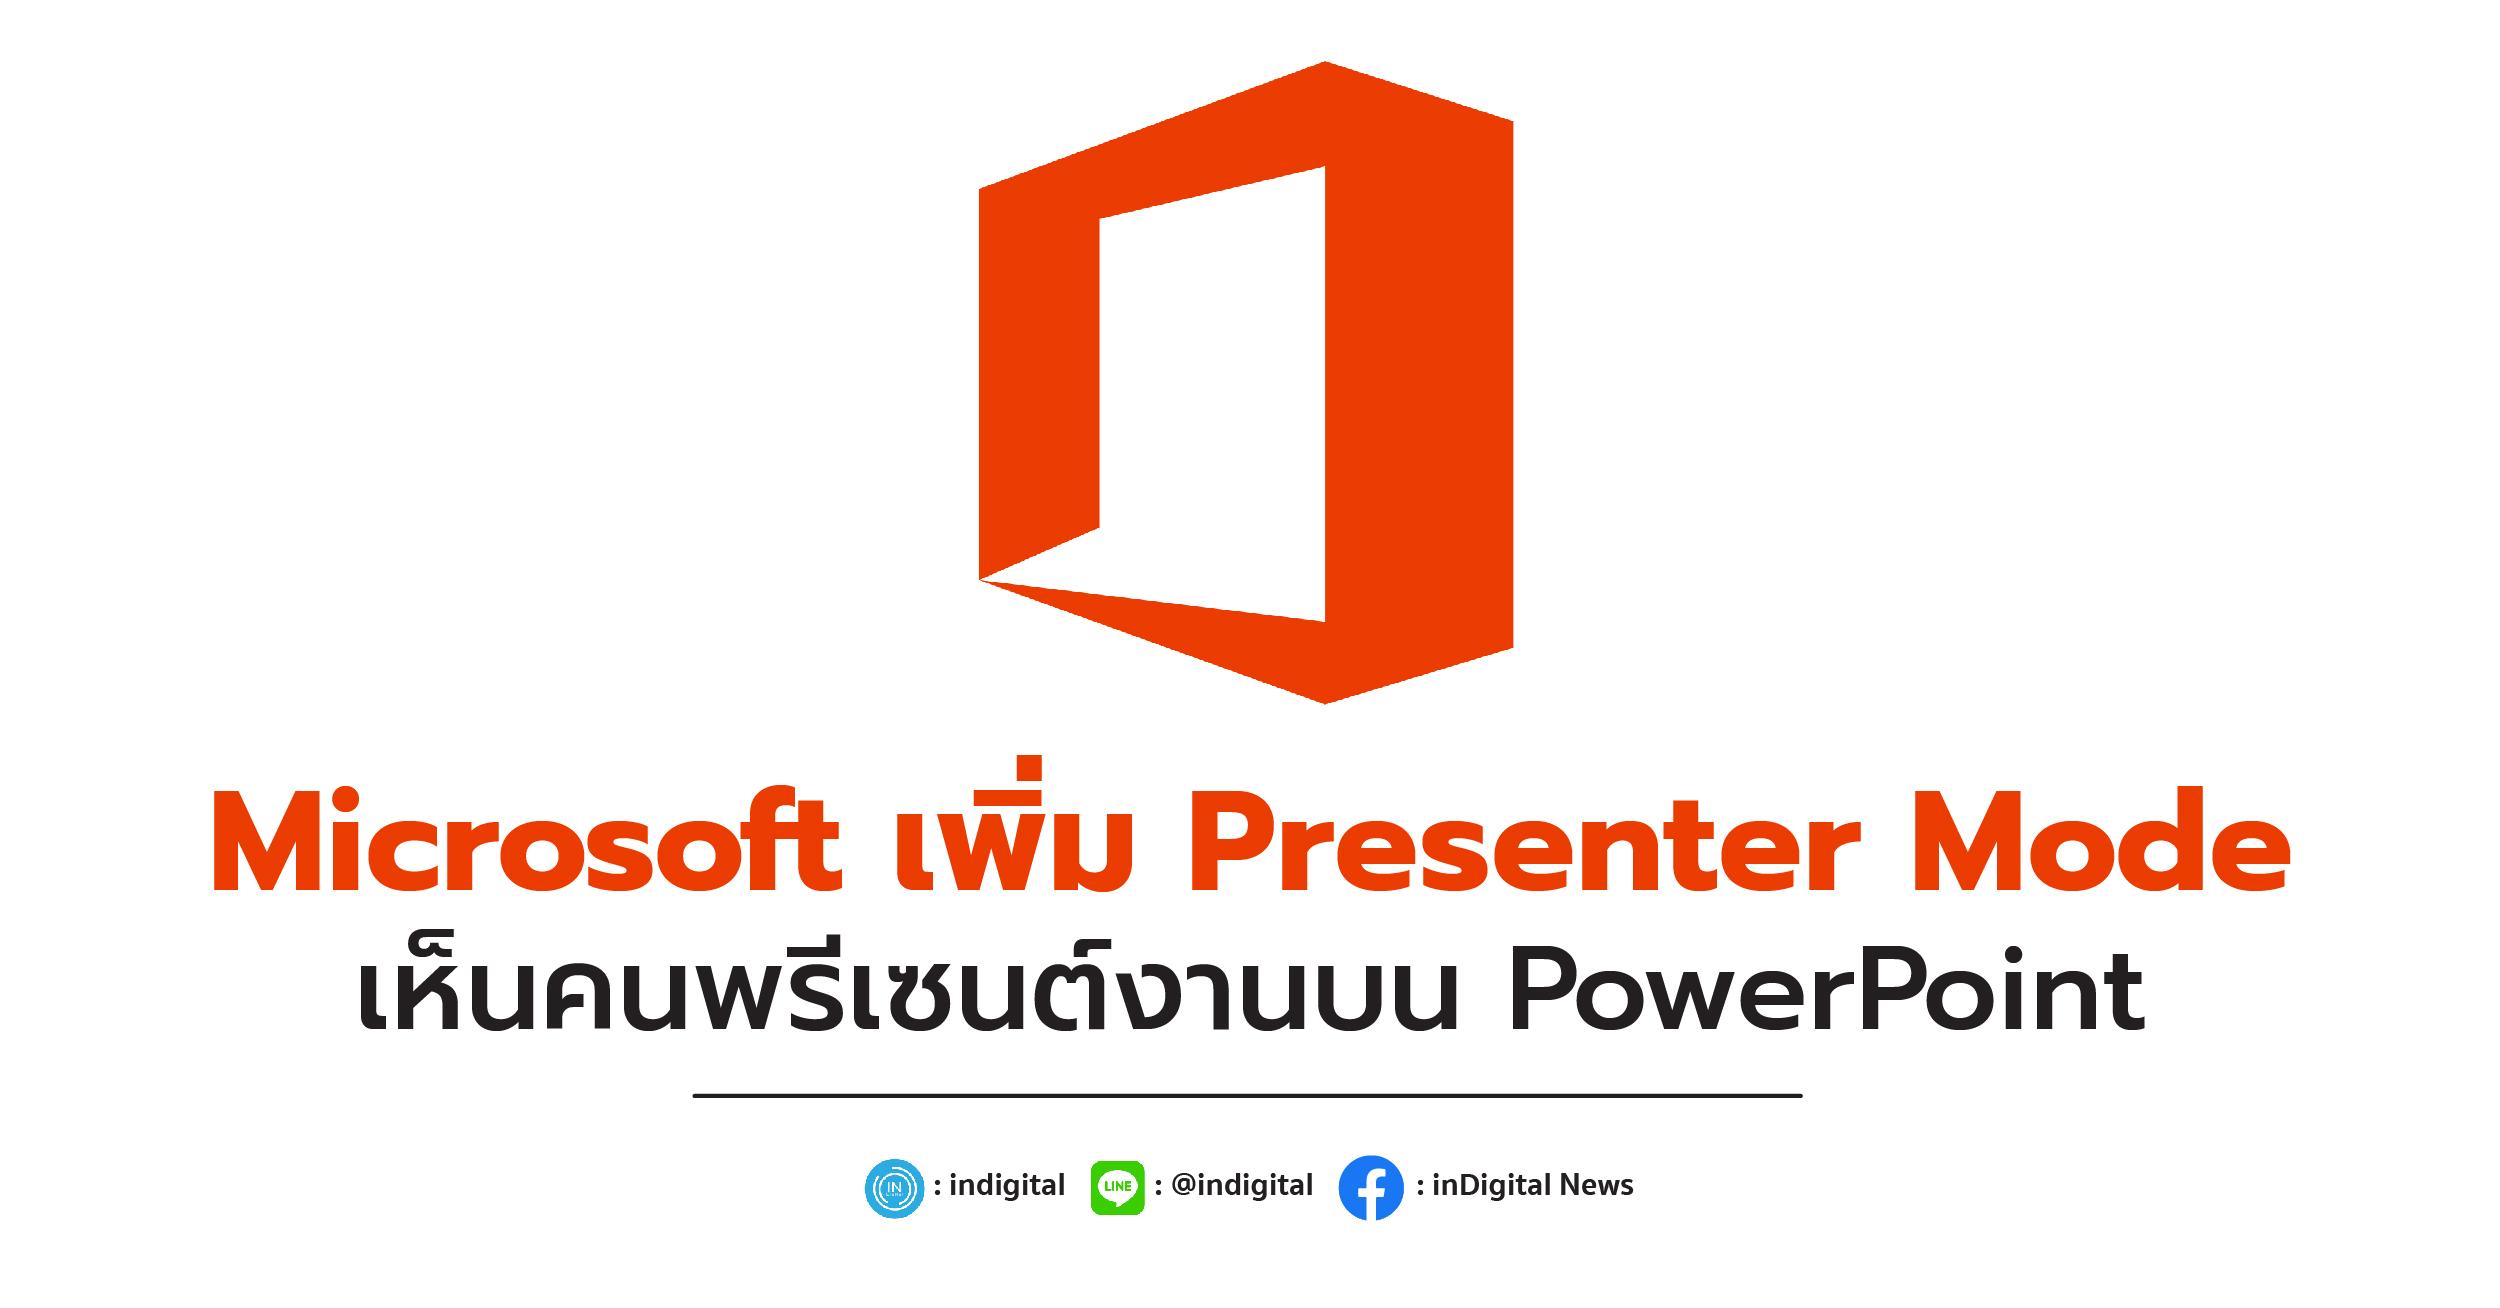 Microsoft เพิ่ม Presenter Mode เห็นคนพรีเซนต์งานบน PowerPoint